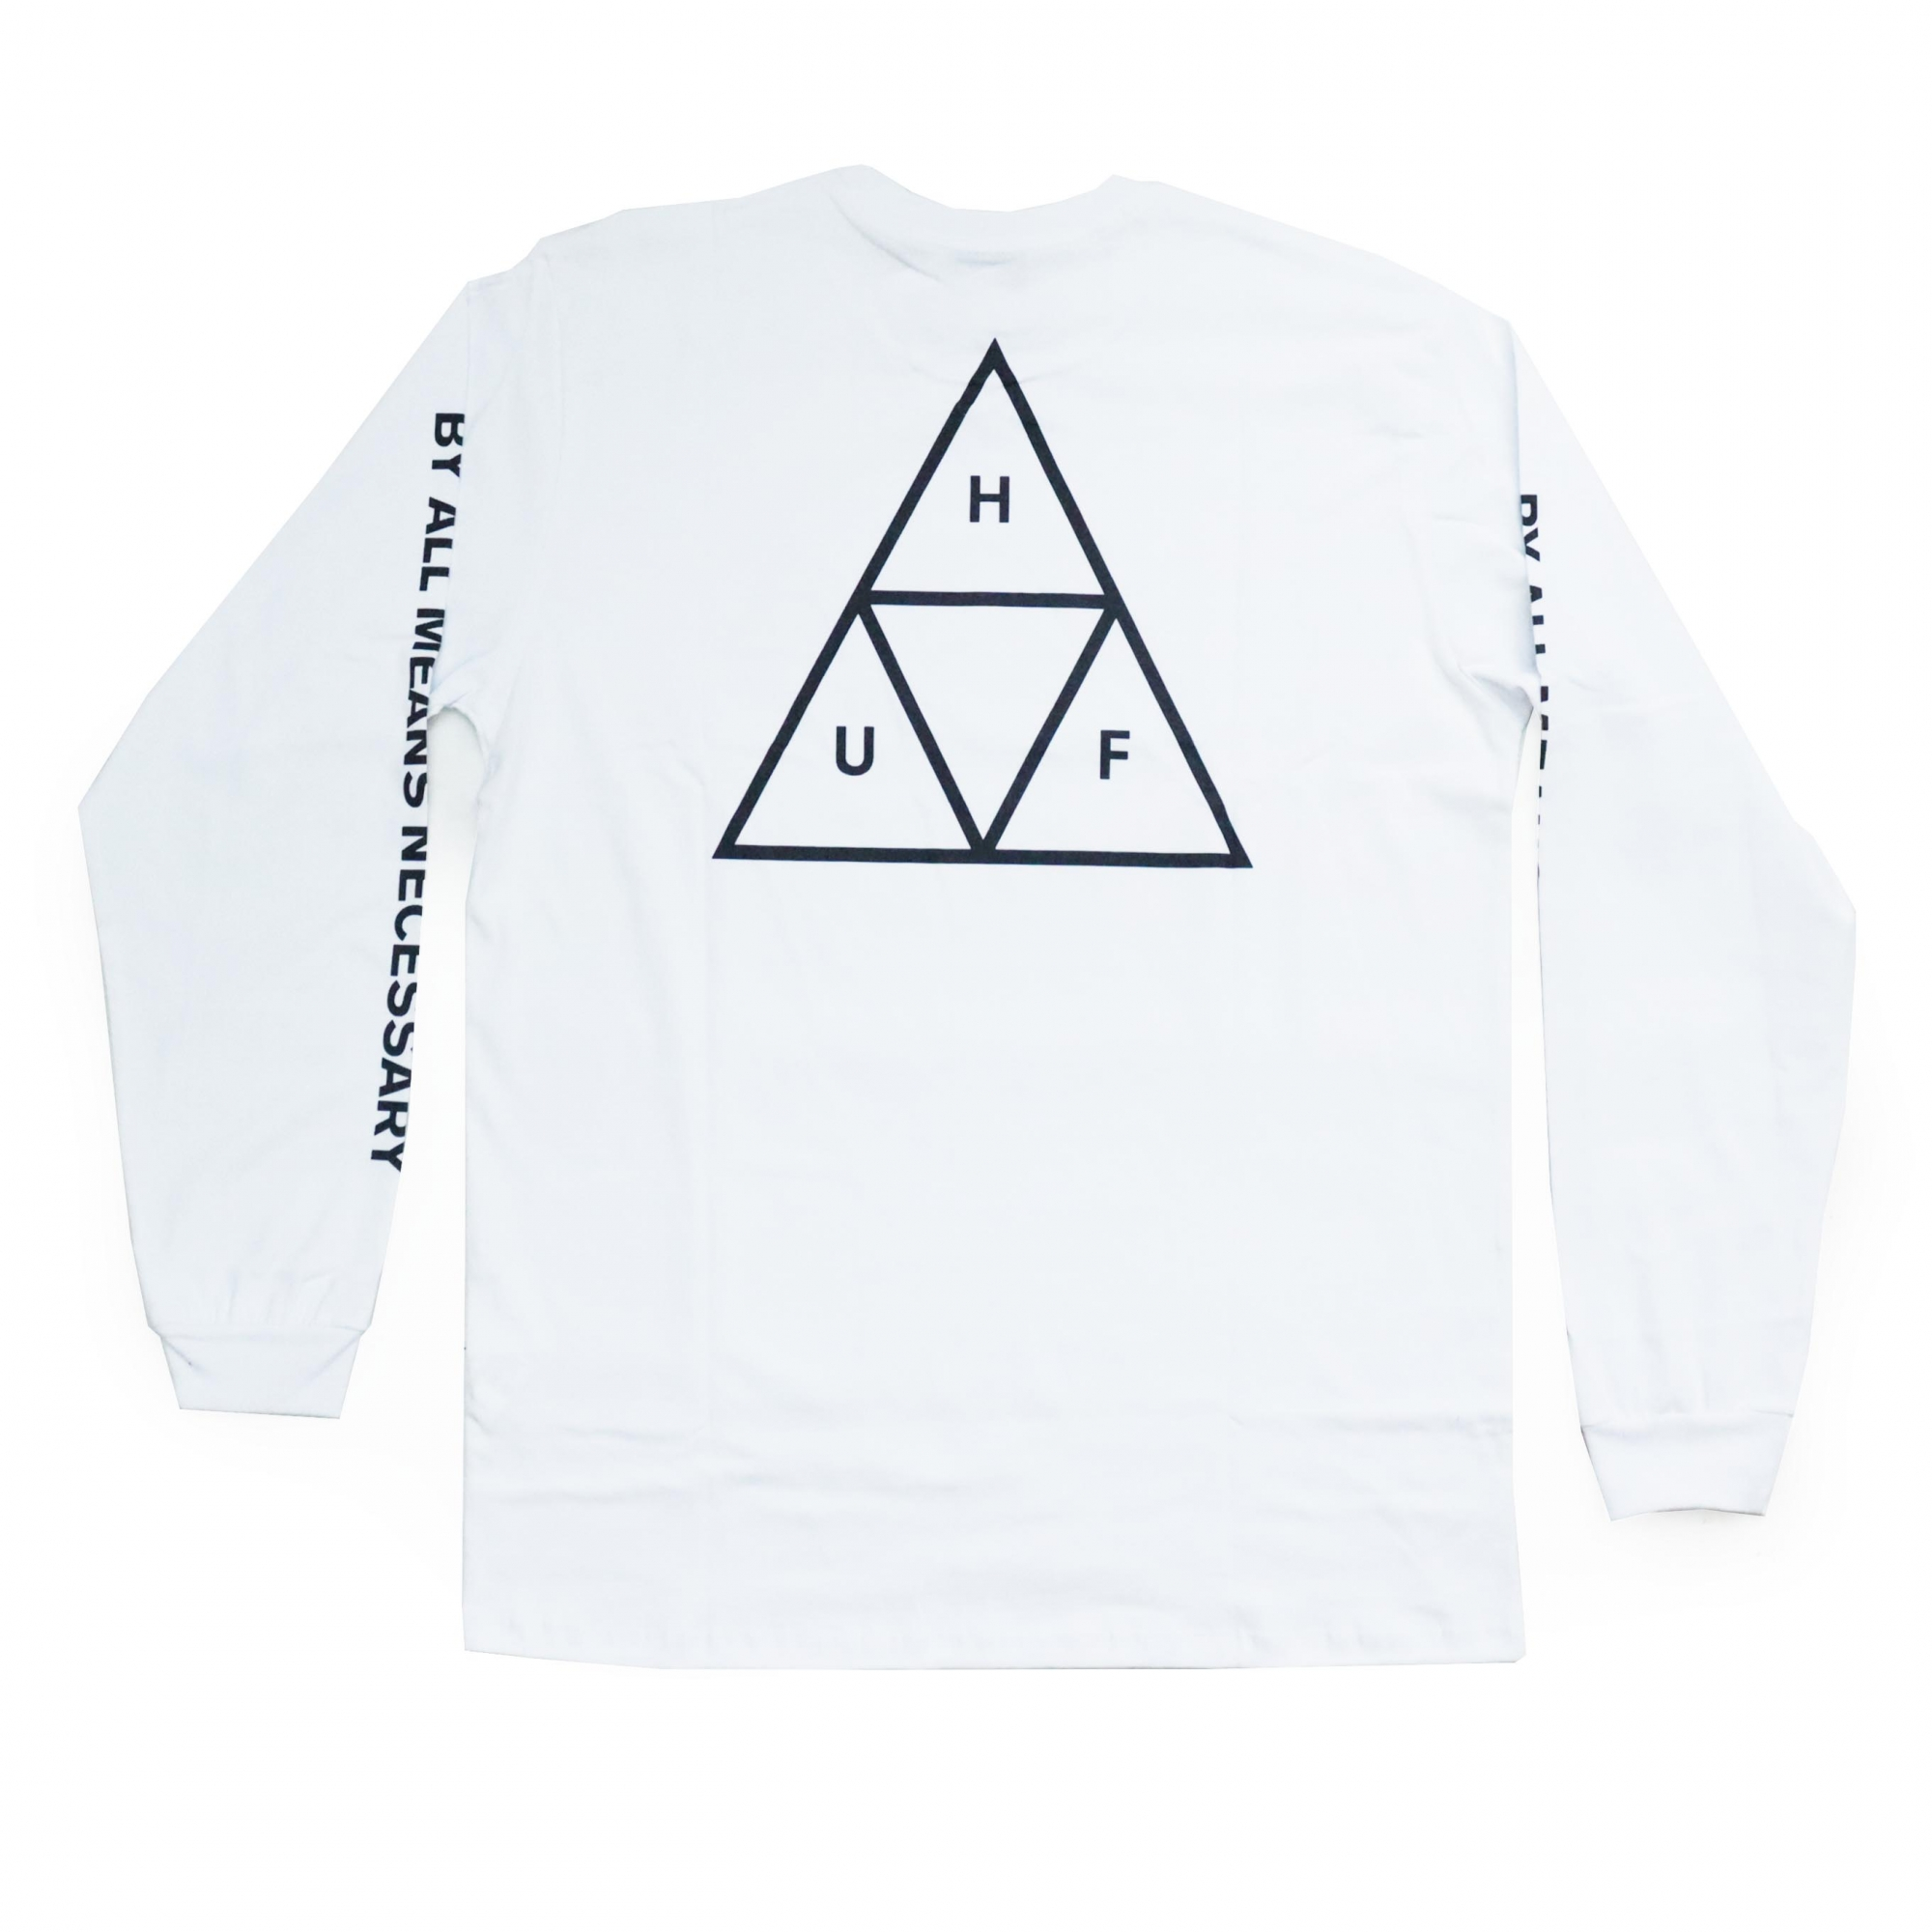 Camiseta Manga Longa HUF Essentials TT - Branco